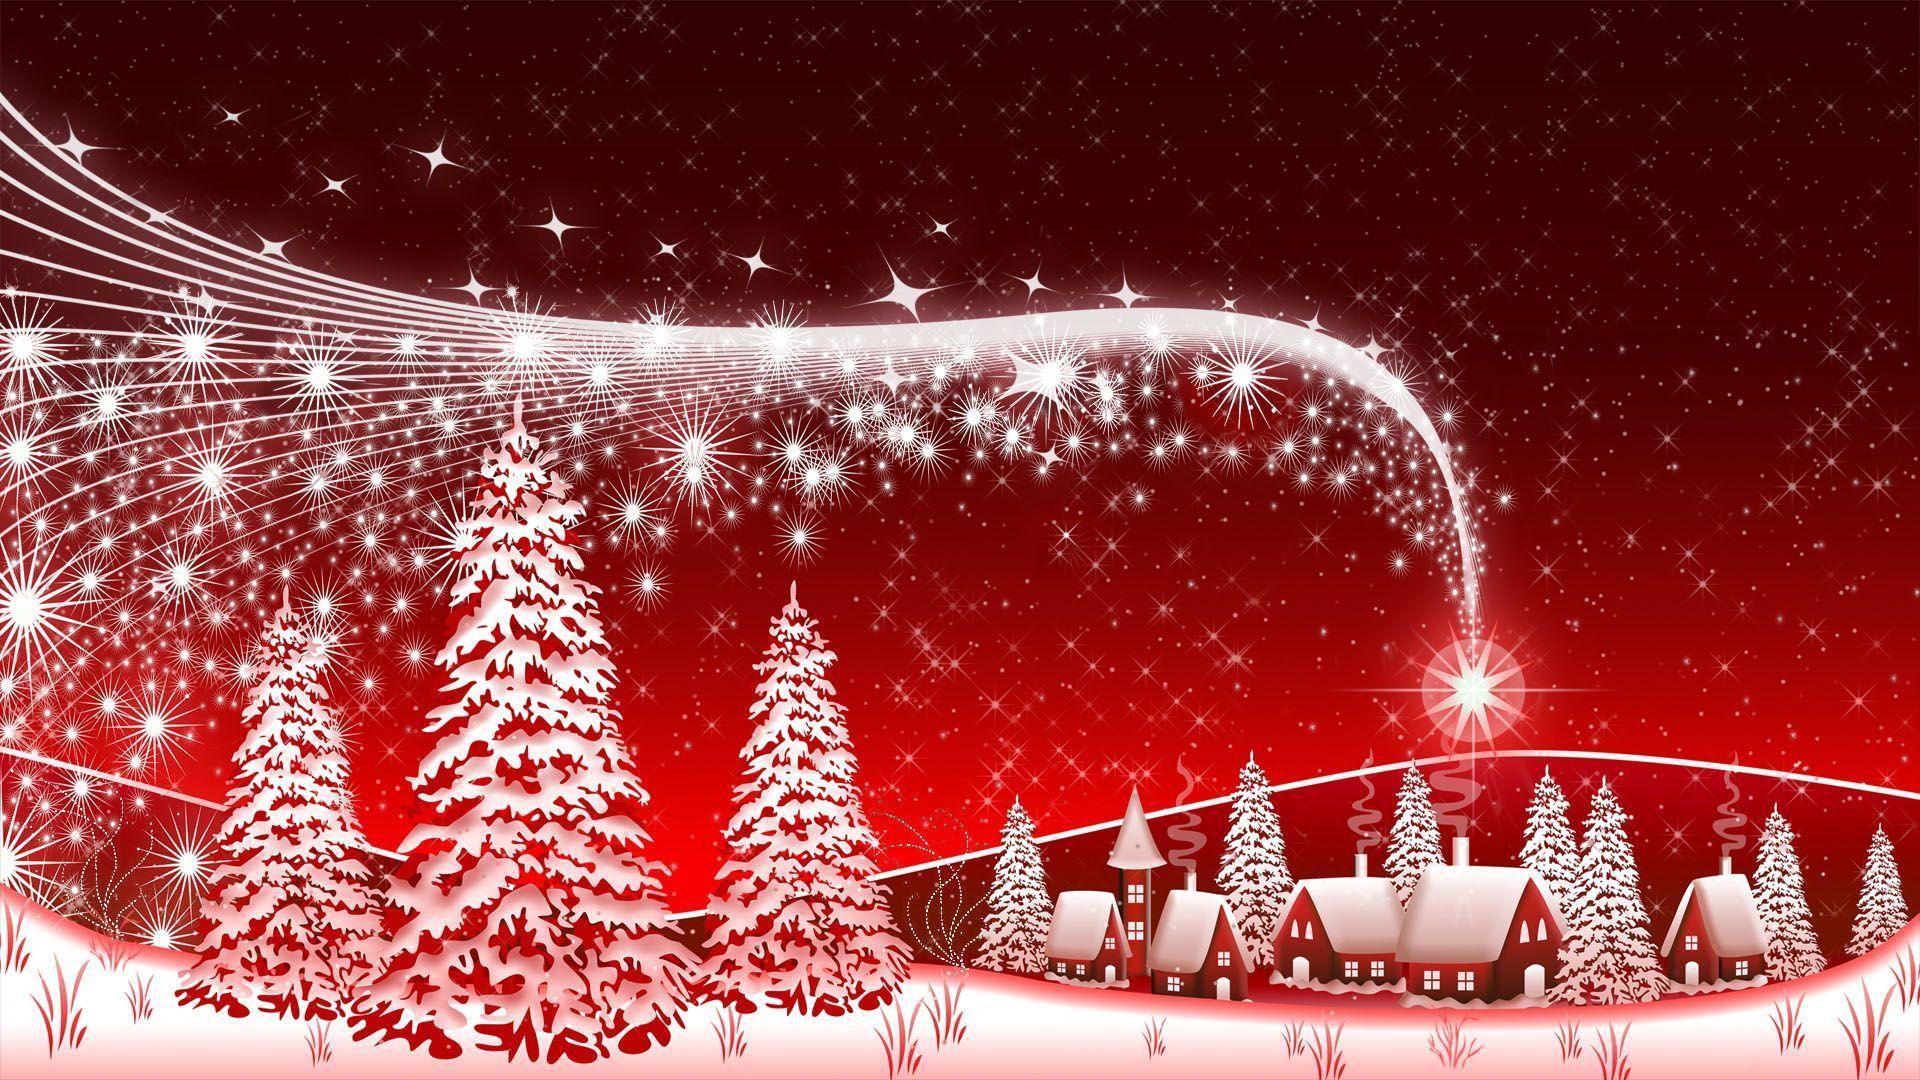 Winter Christmas Wallpaper Hd For Free Wallpaper